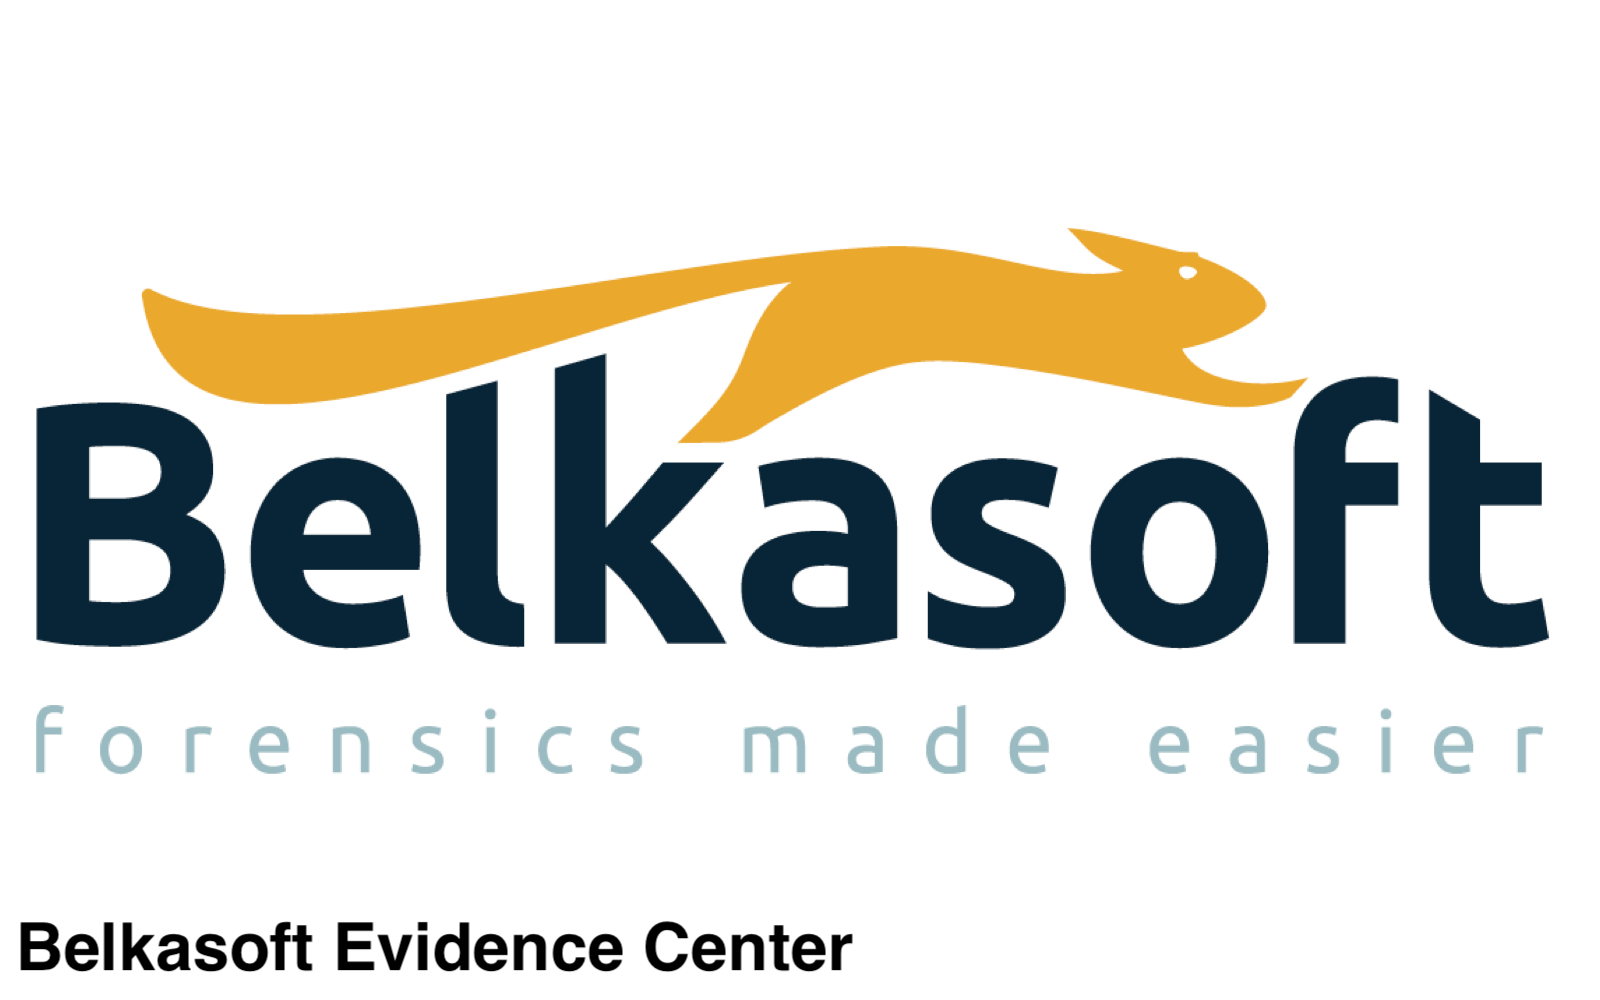 Belkasoft logo